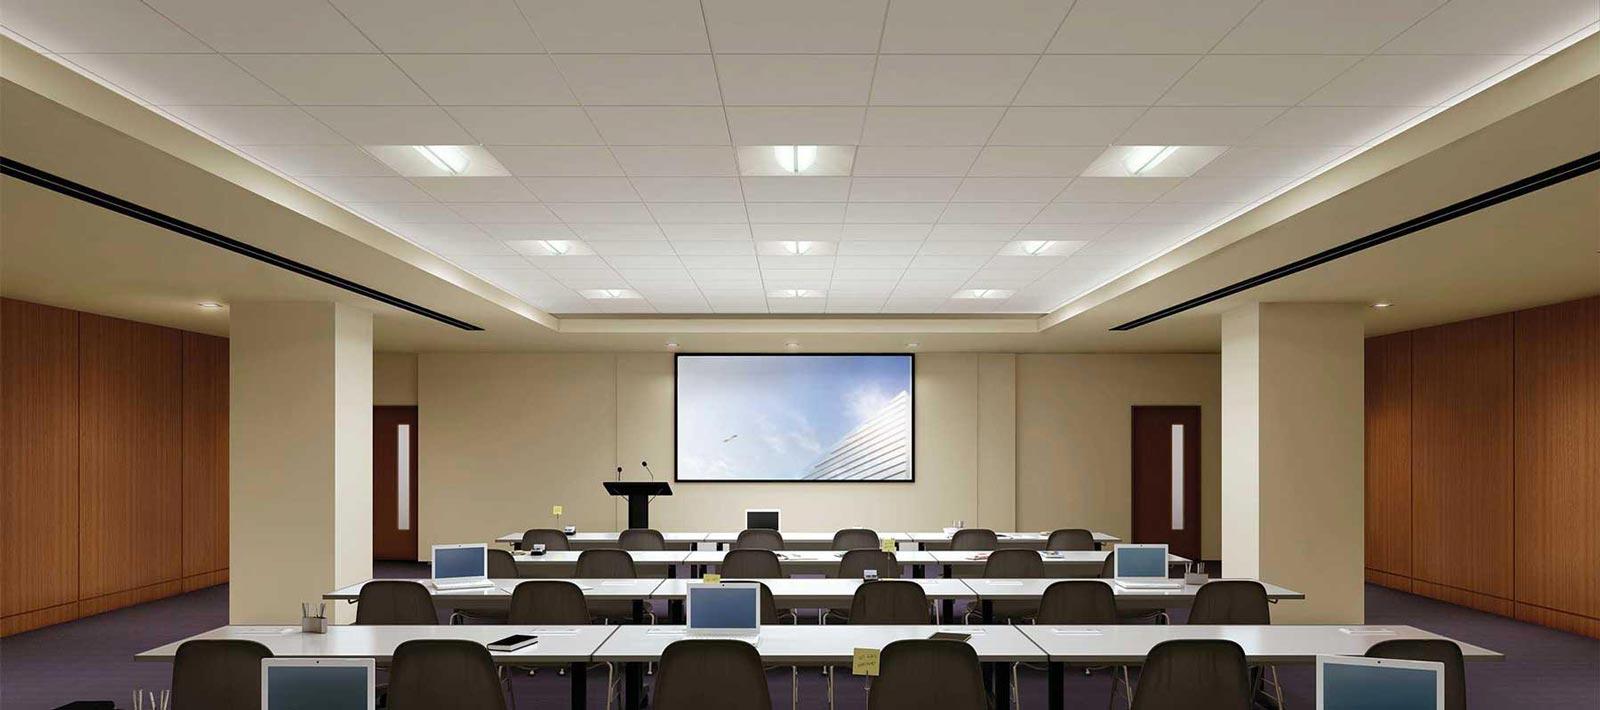 FAR_classroom